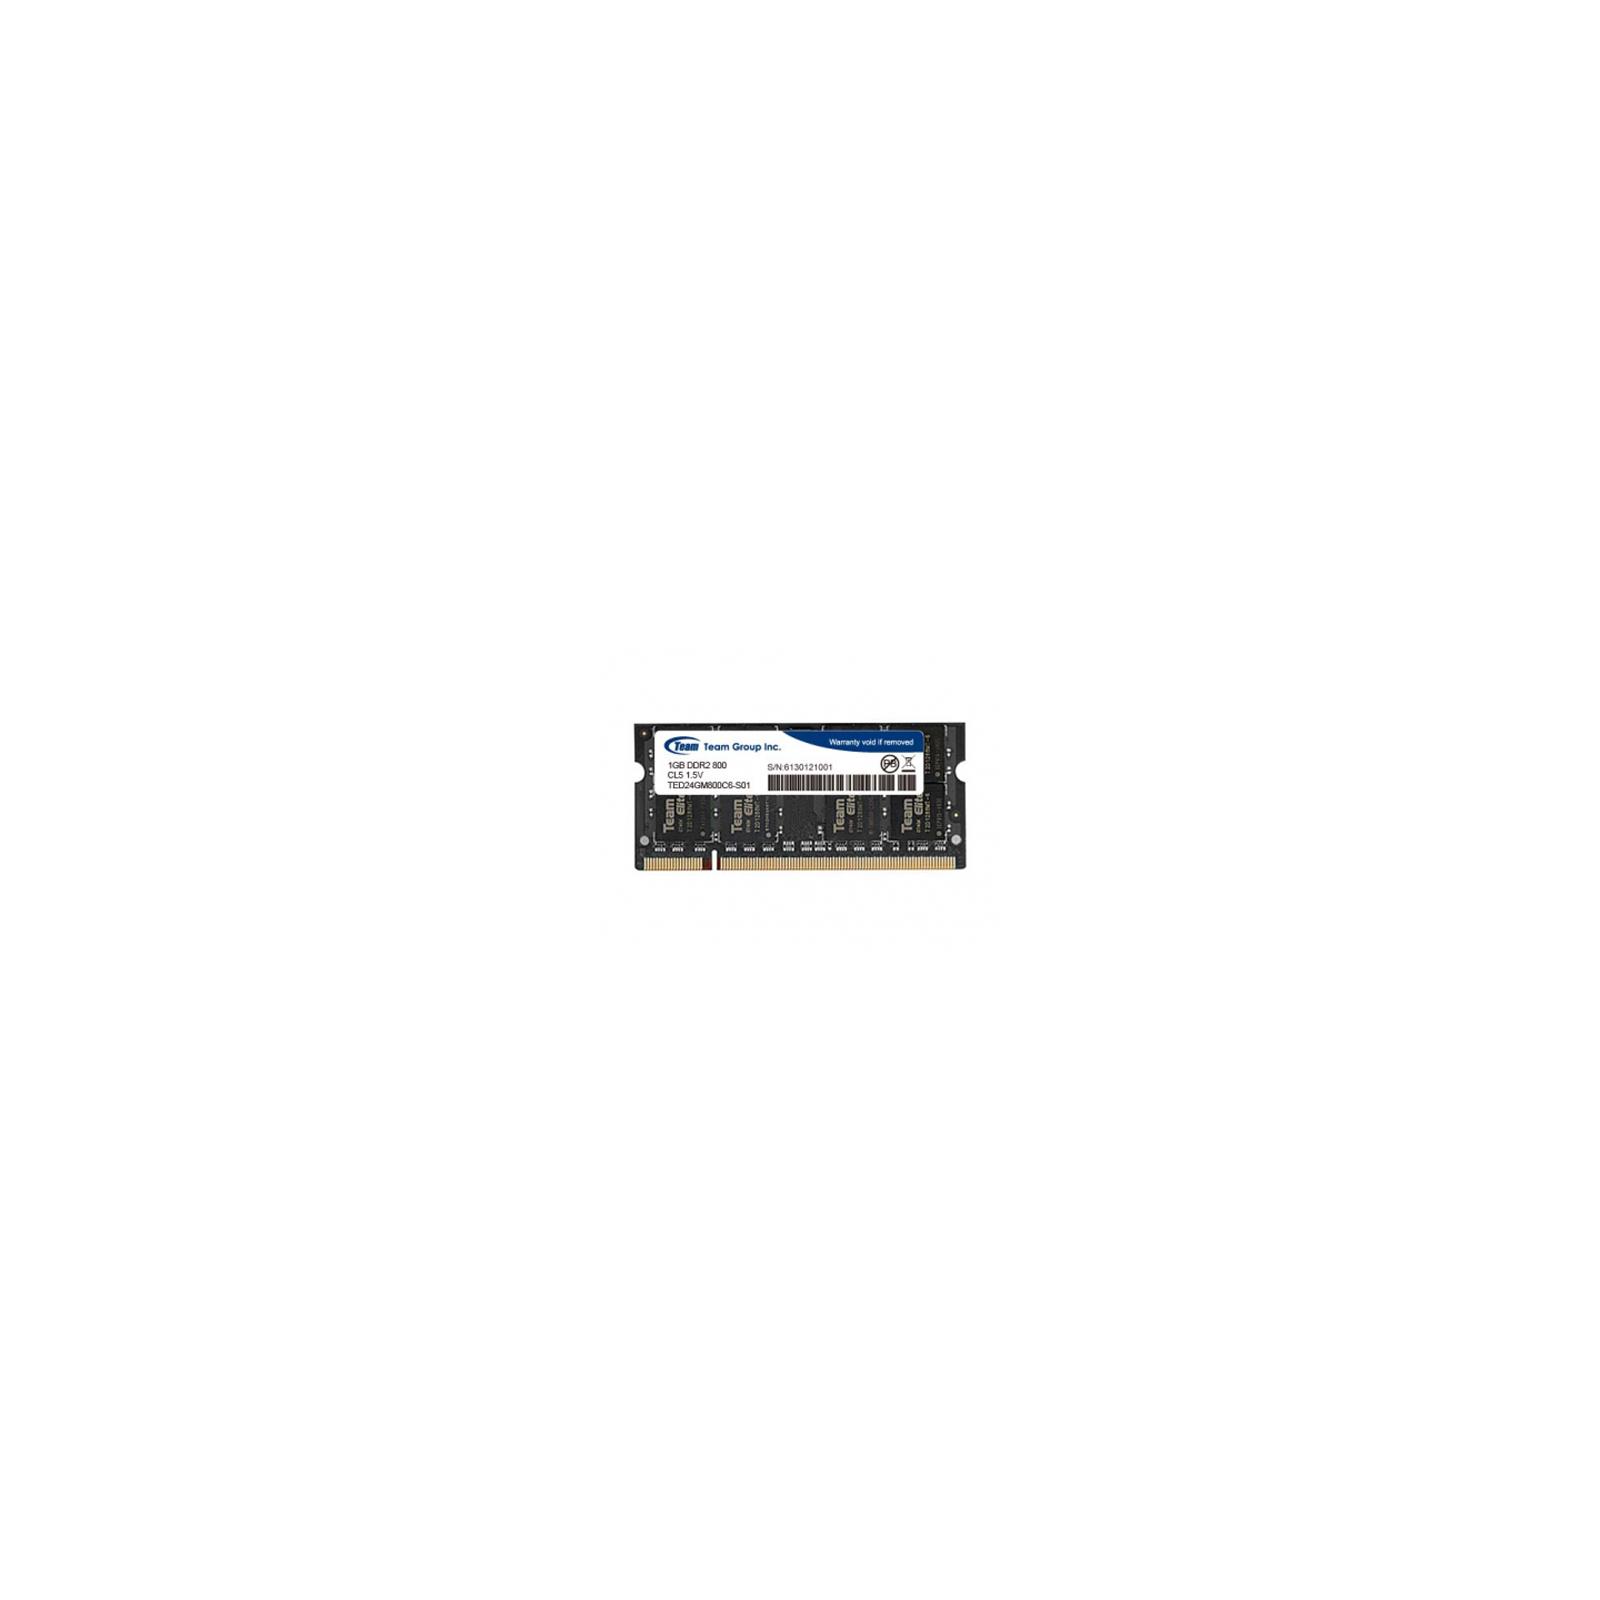 Модуль памяти для компьютера DDR2 1GB 800 MHz Team (TED21G800C5-SBK) изображение 2